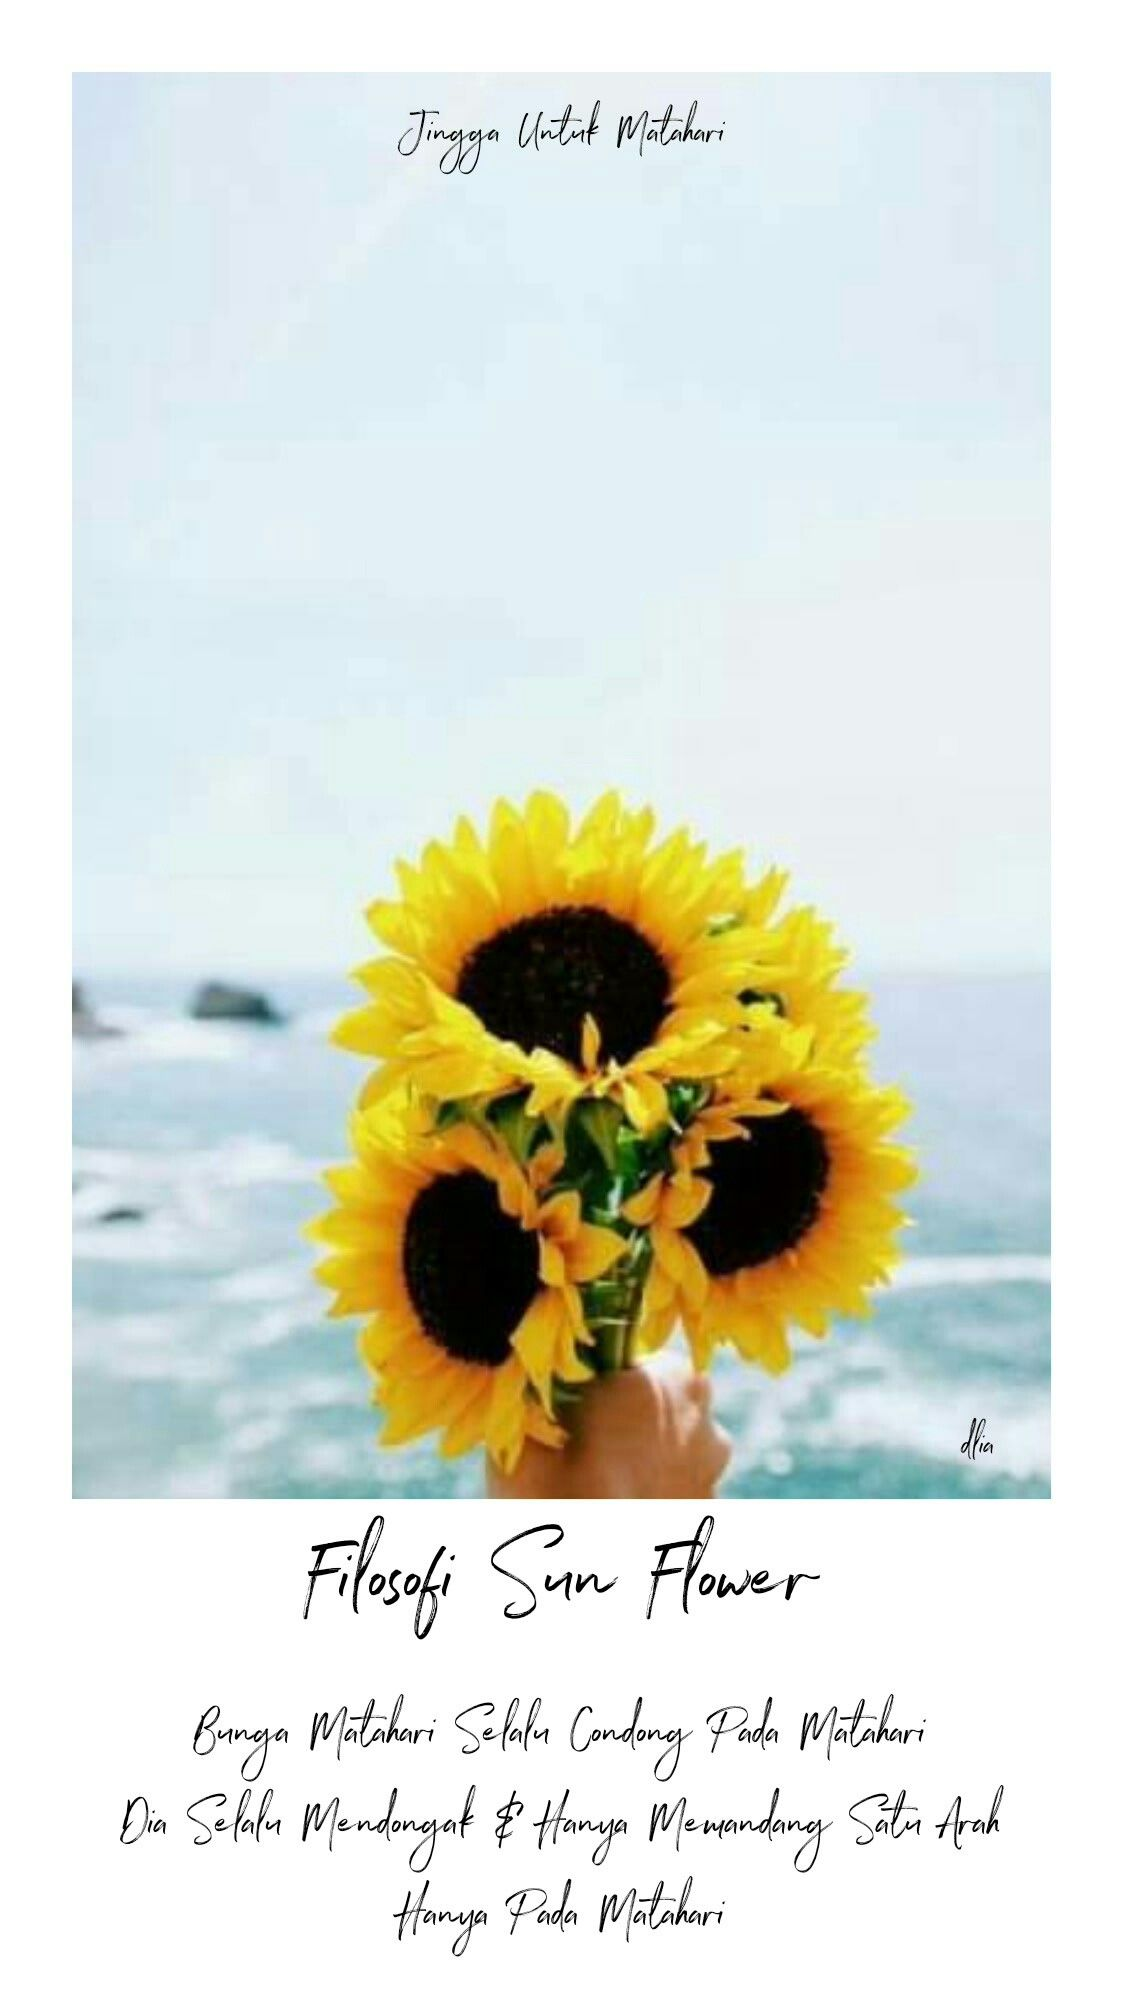 Filosofi Sun Flower Q In A Book Trilogi Jingga Untuk